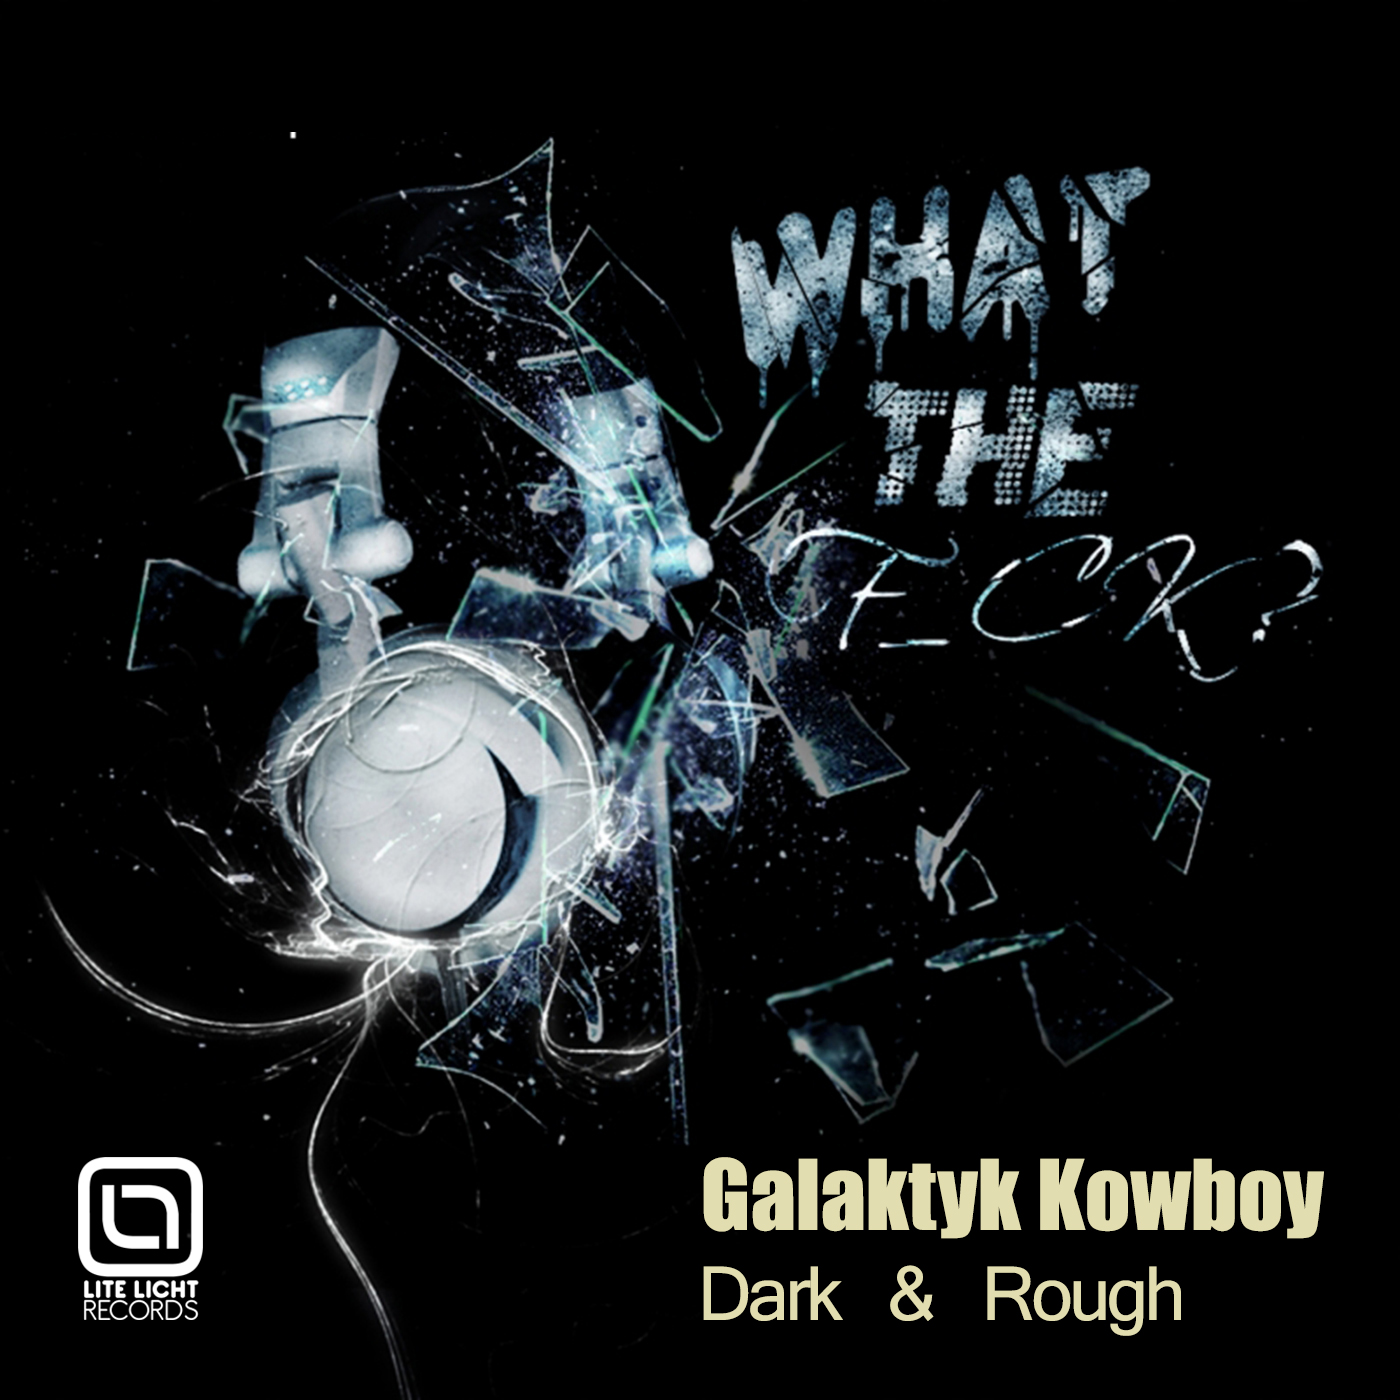 Galaktyk-Kowboy